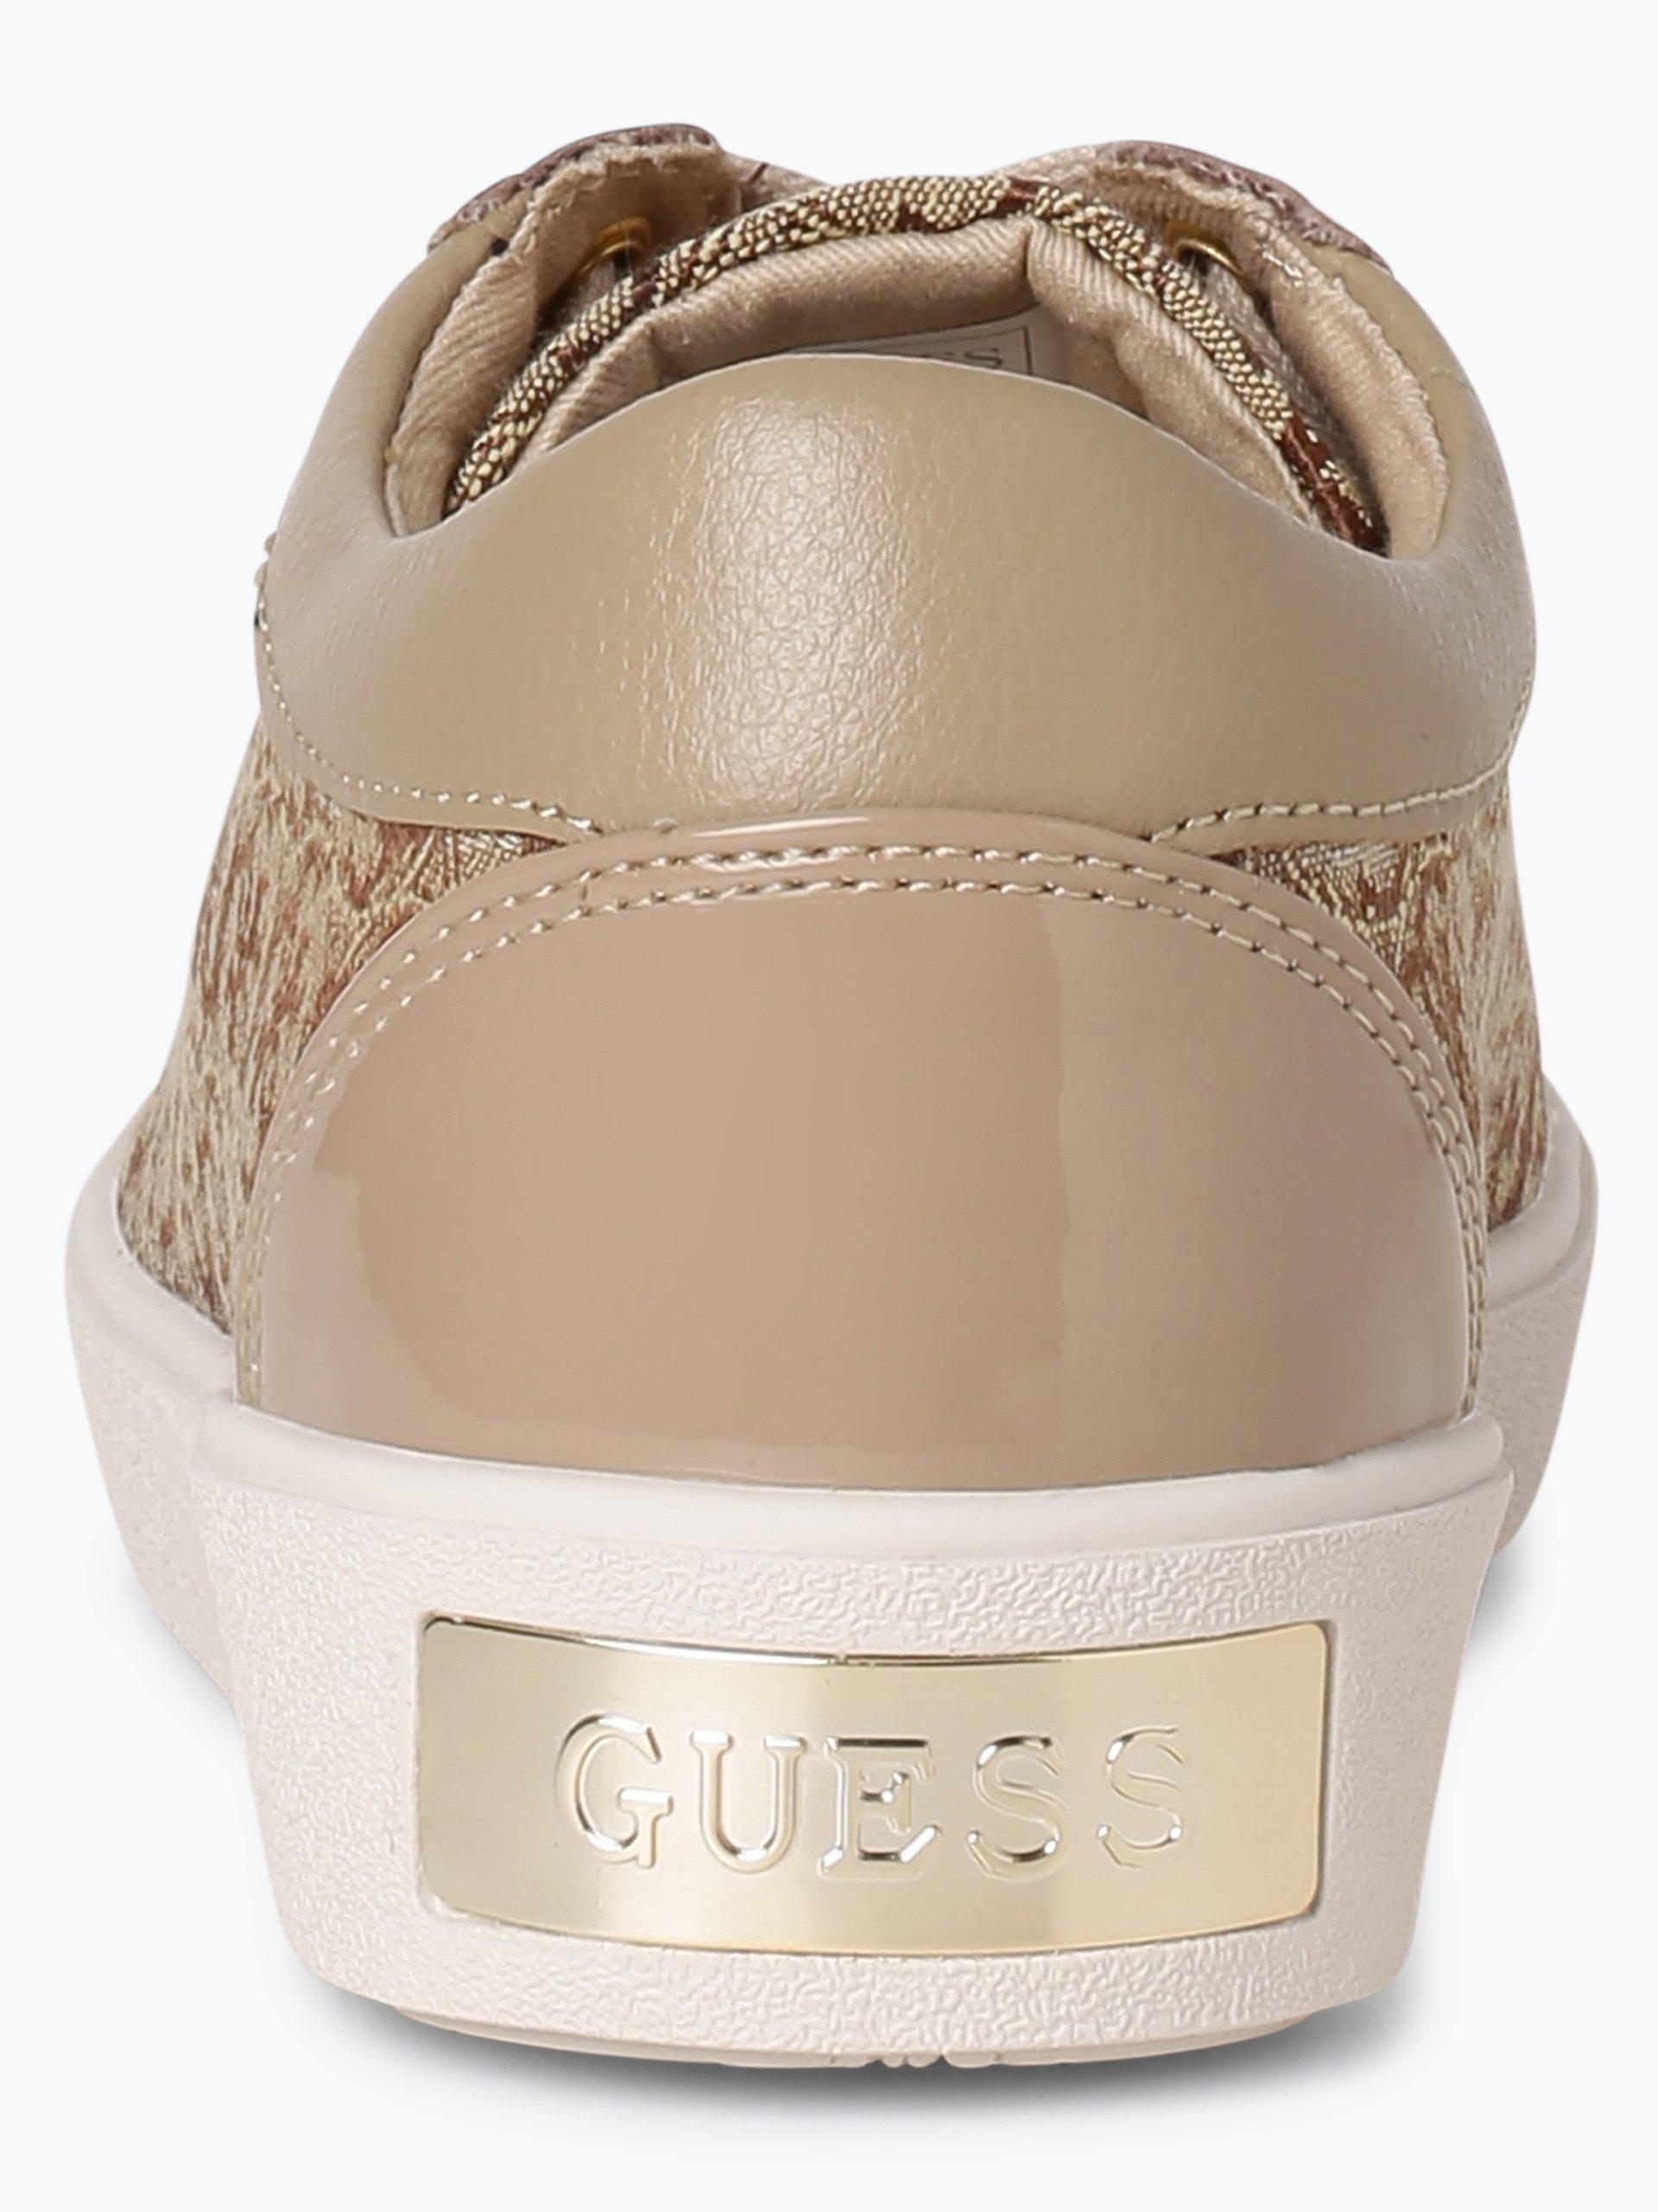 Guess Jeans Damen Sneaker mit Leder-Anteil